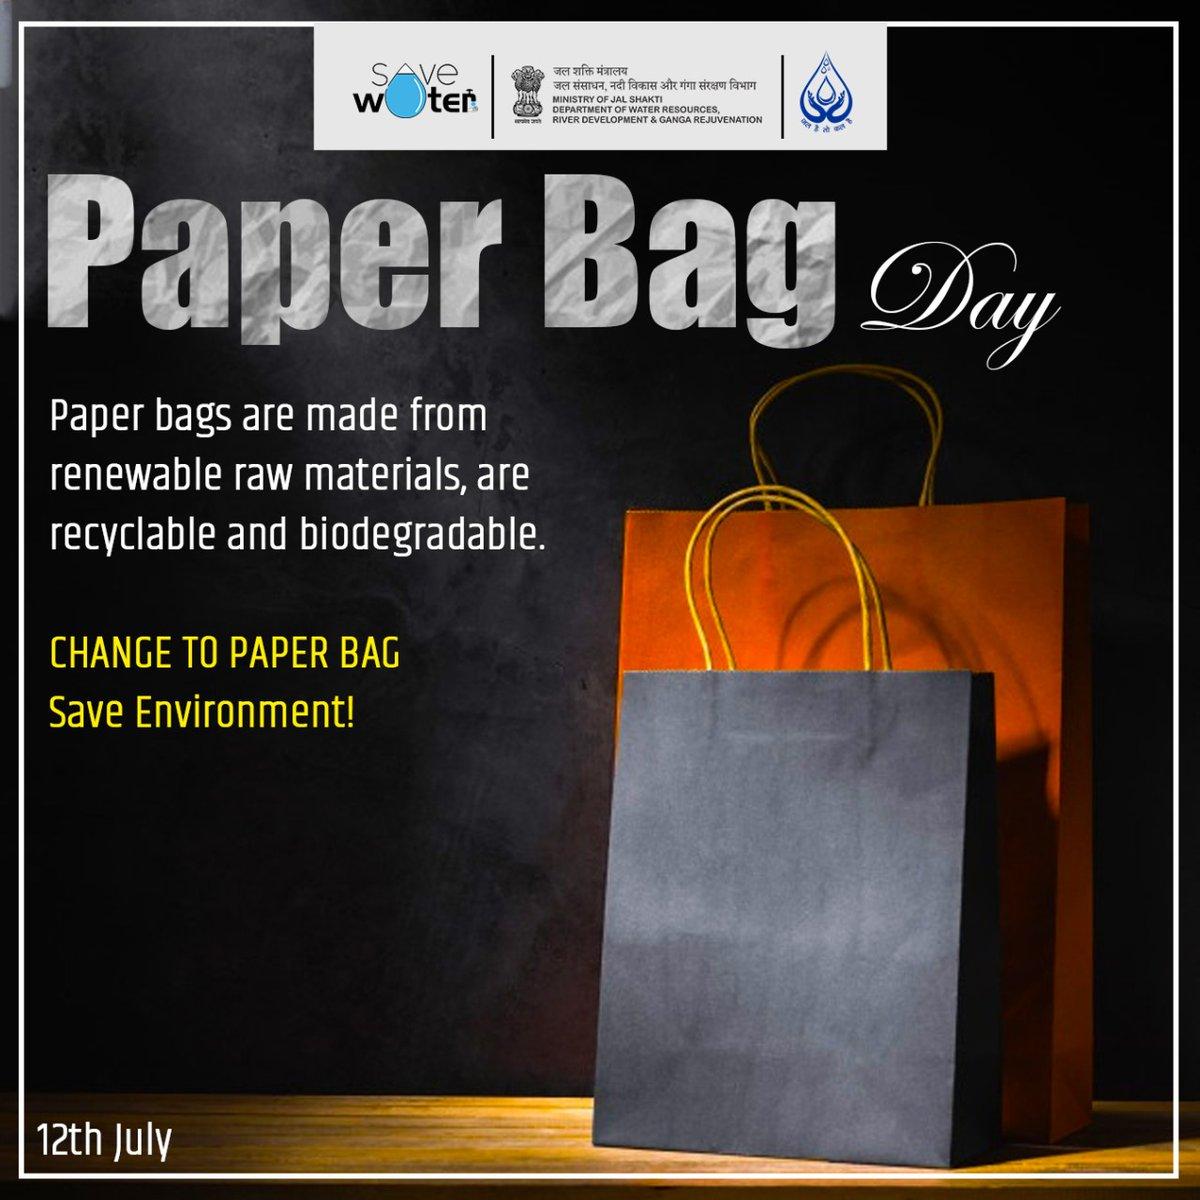 Let's make a shift to a better world🛍️#PaperBagDay #SayNoToSingleUsePlastic #SaveEnvironment https://t.co/CyDjKxg80X